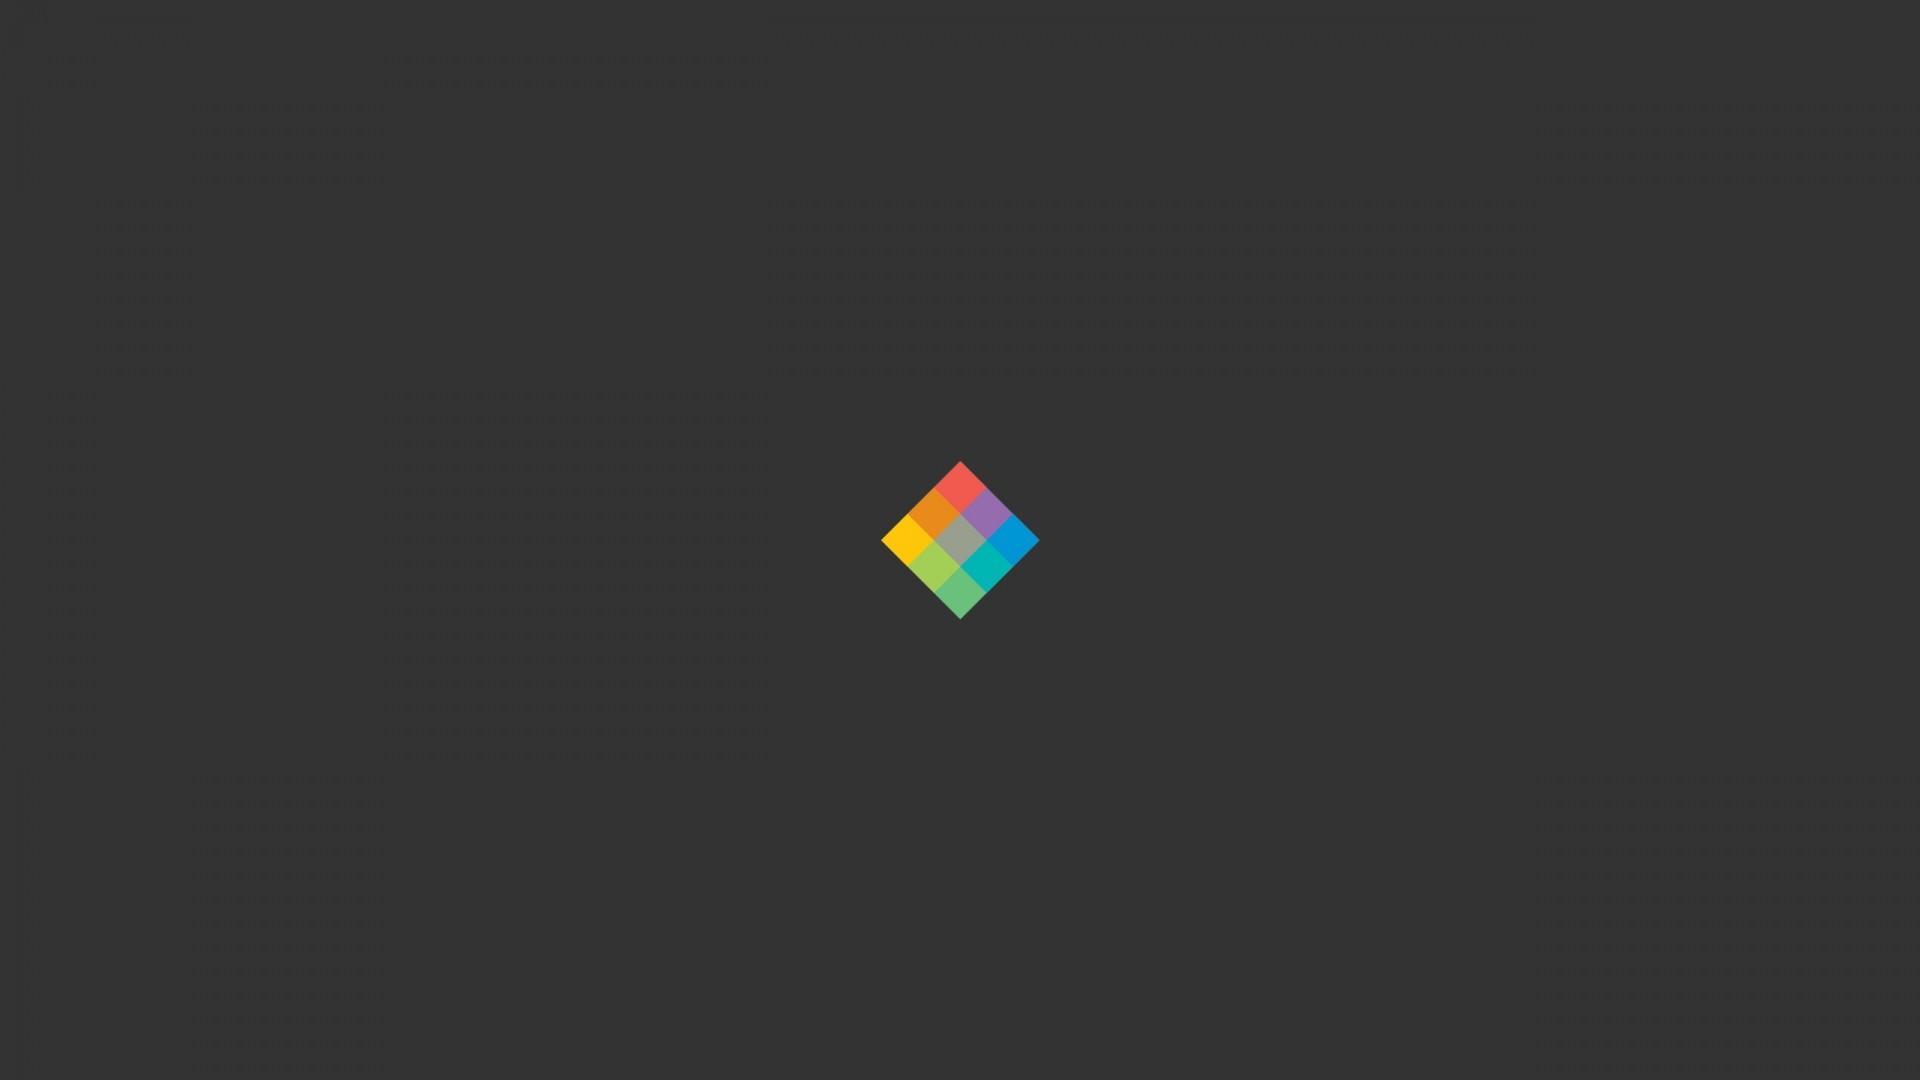 Minimal Hd Wallpapers 1080p